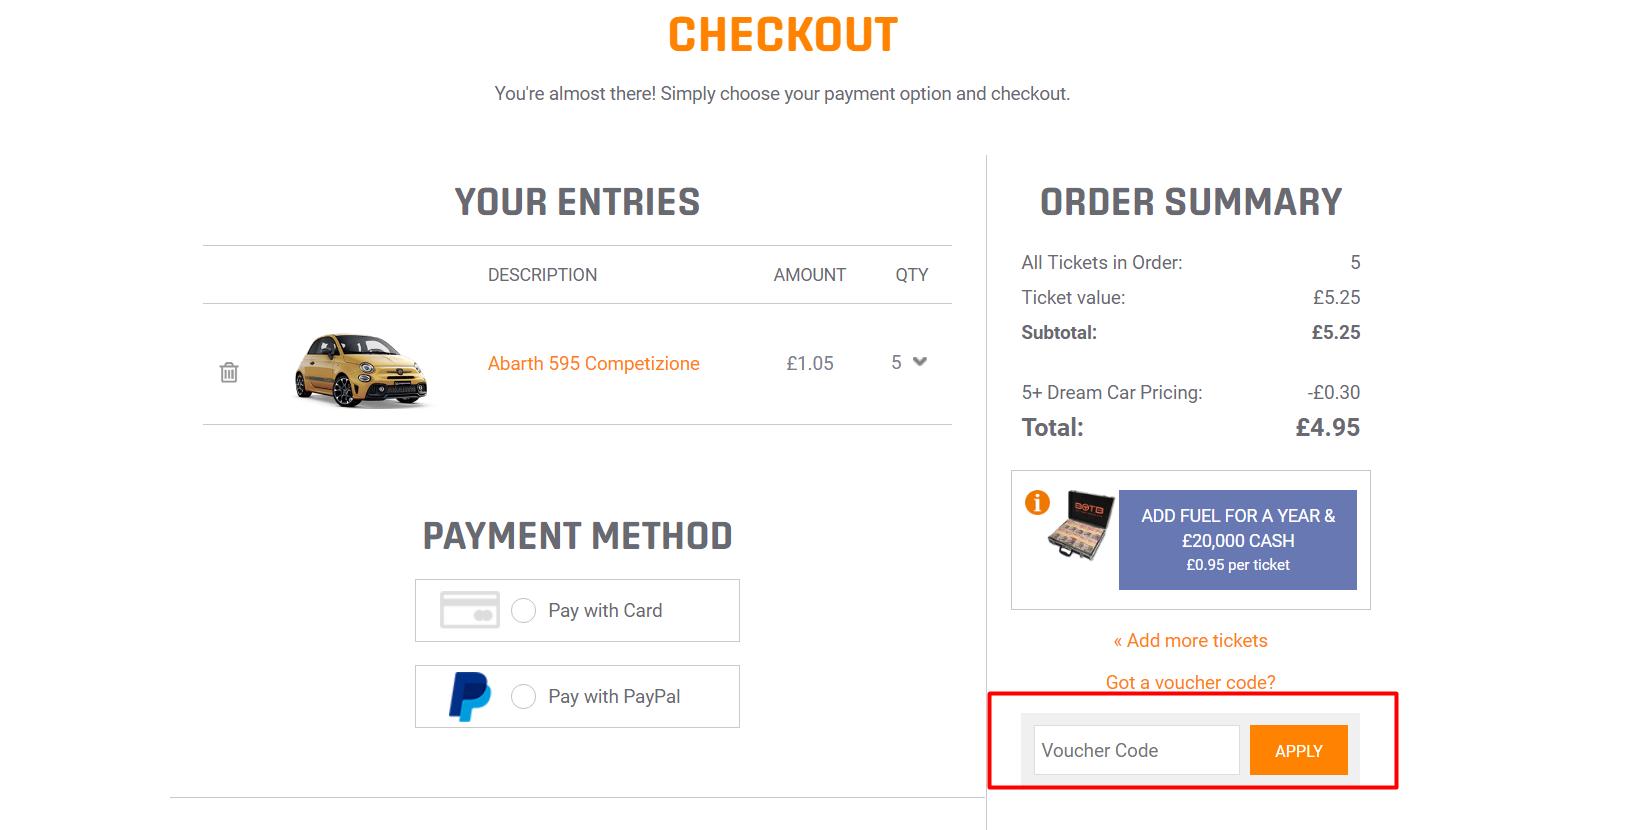 How do I use my BOTB discount code?